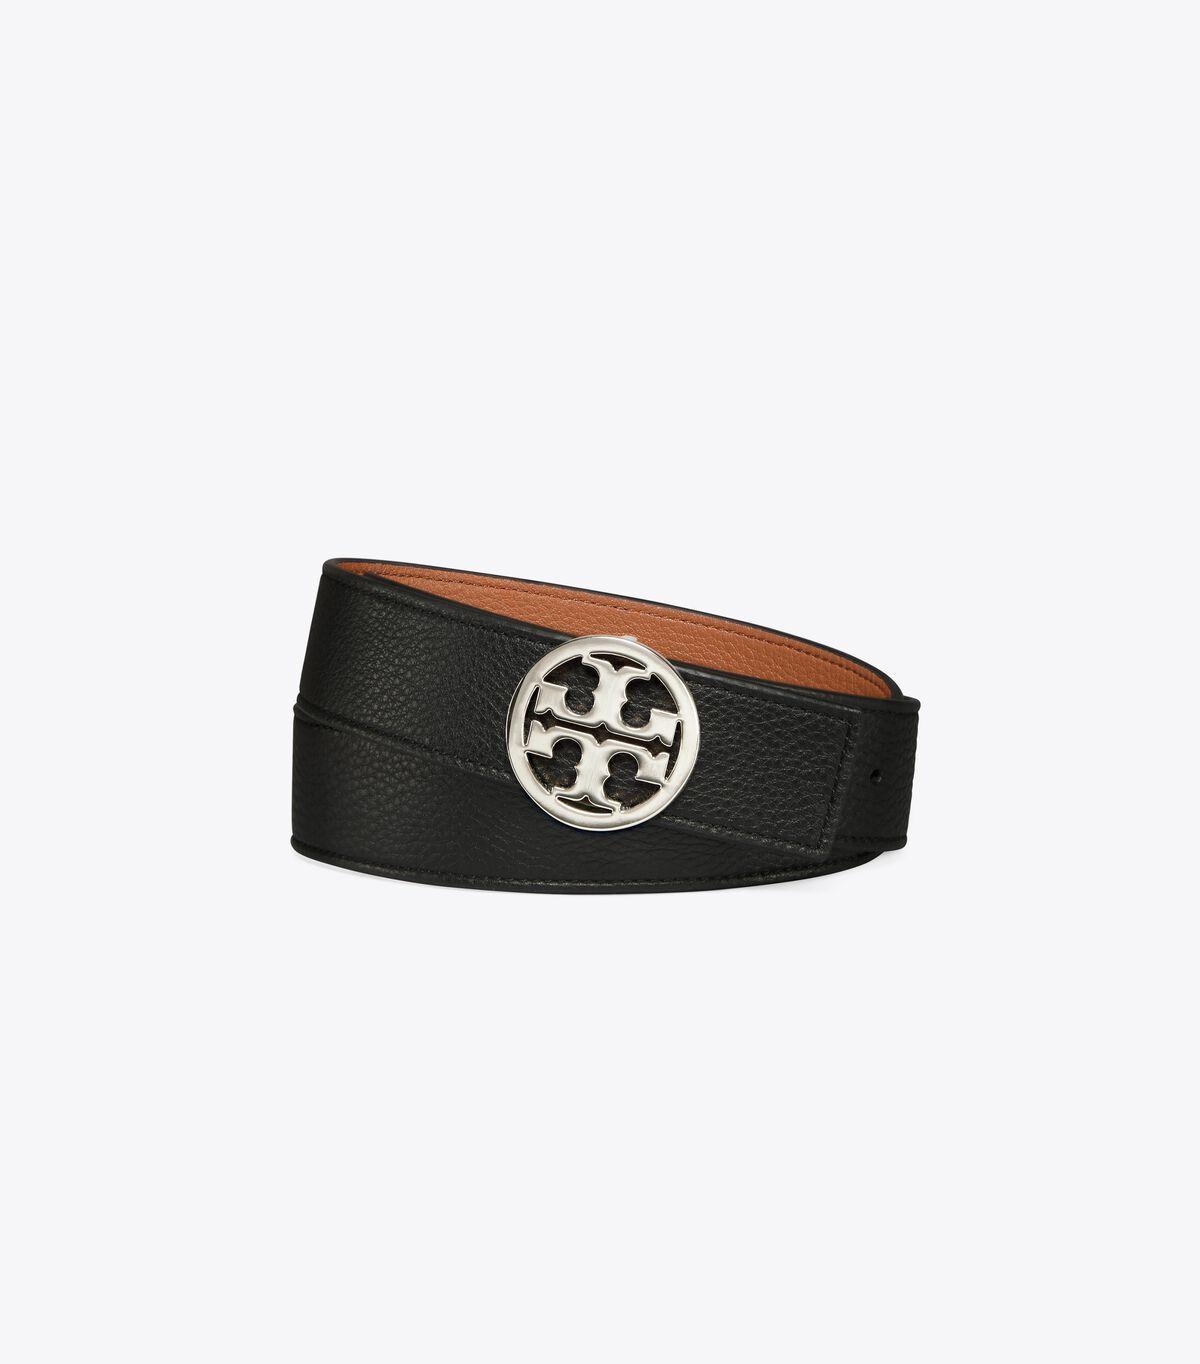 "1 1/2"" Reversible Belt"